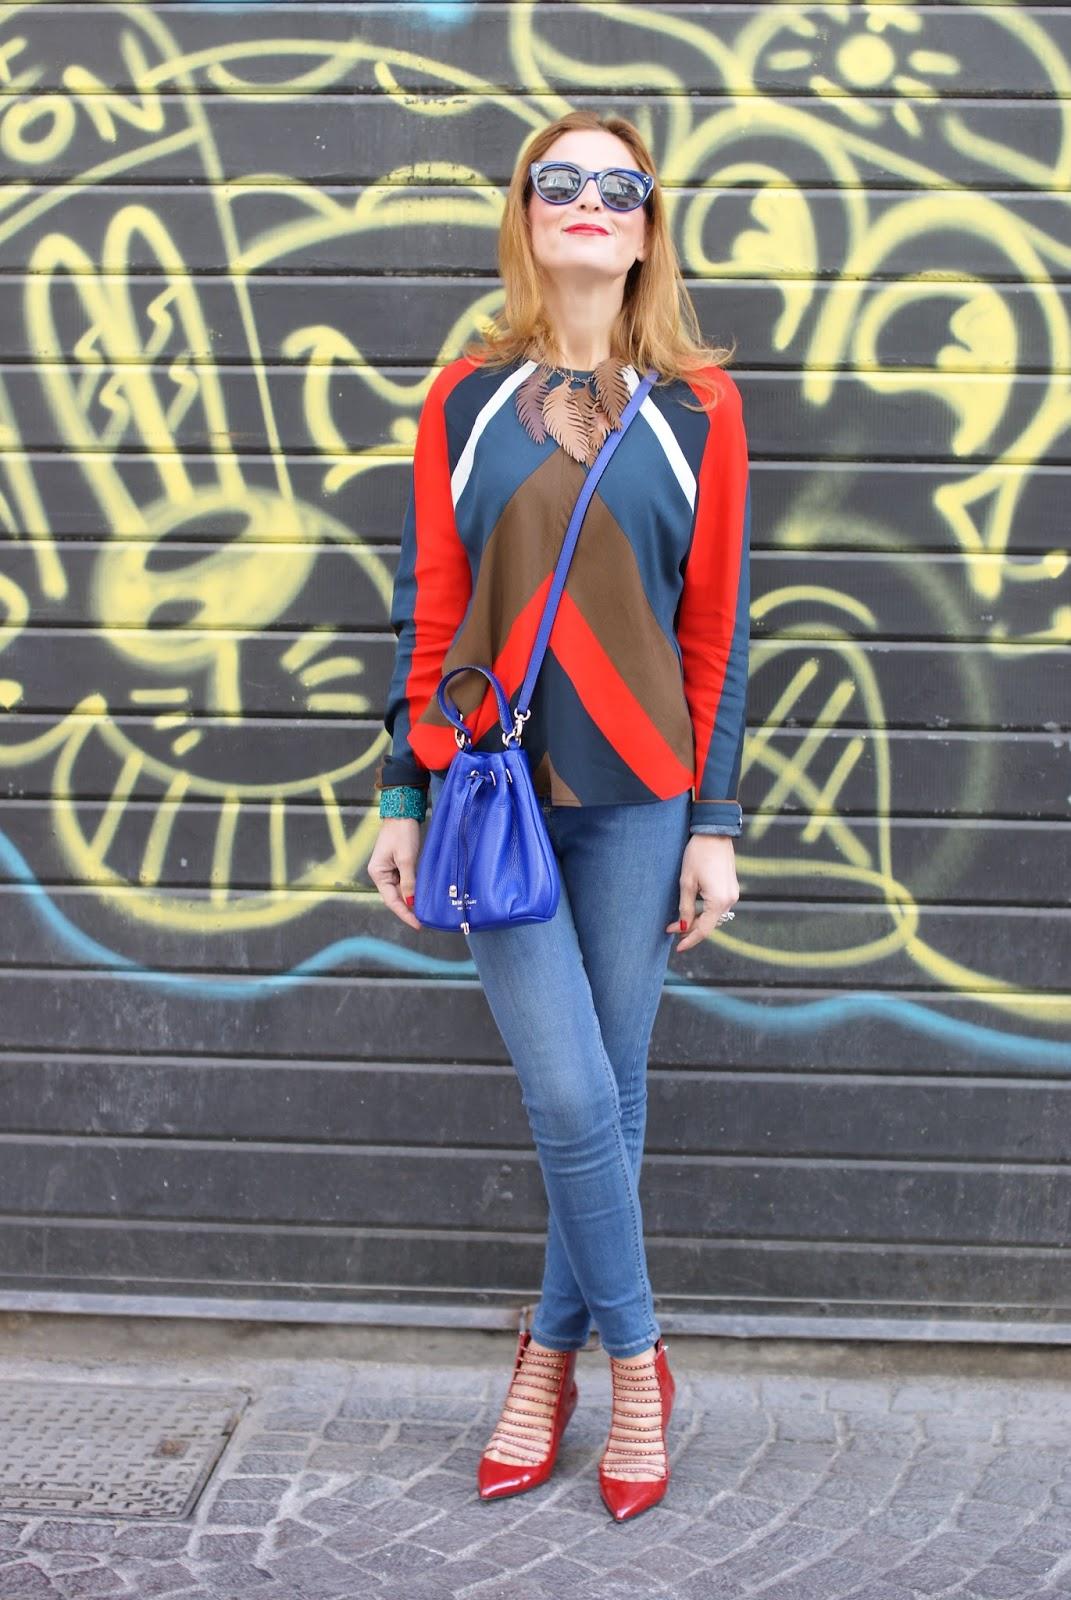 Kate Spade Wyatt mini bucket bag and Le Silla kitten heels on Fashion and Cookies fashion blog, fashion blogger style